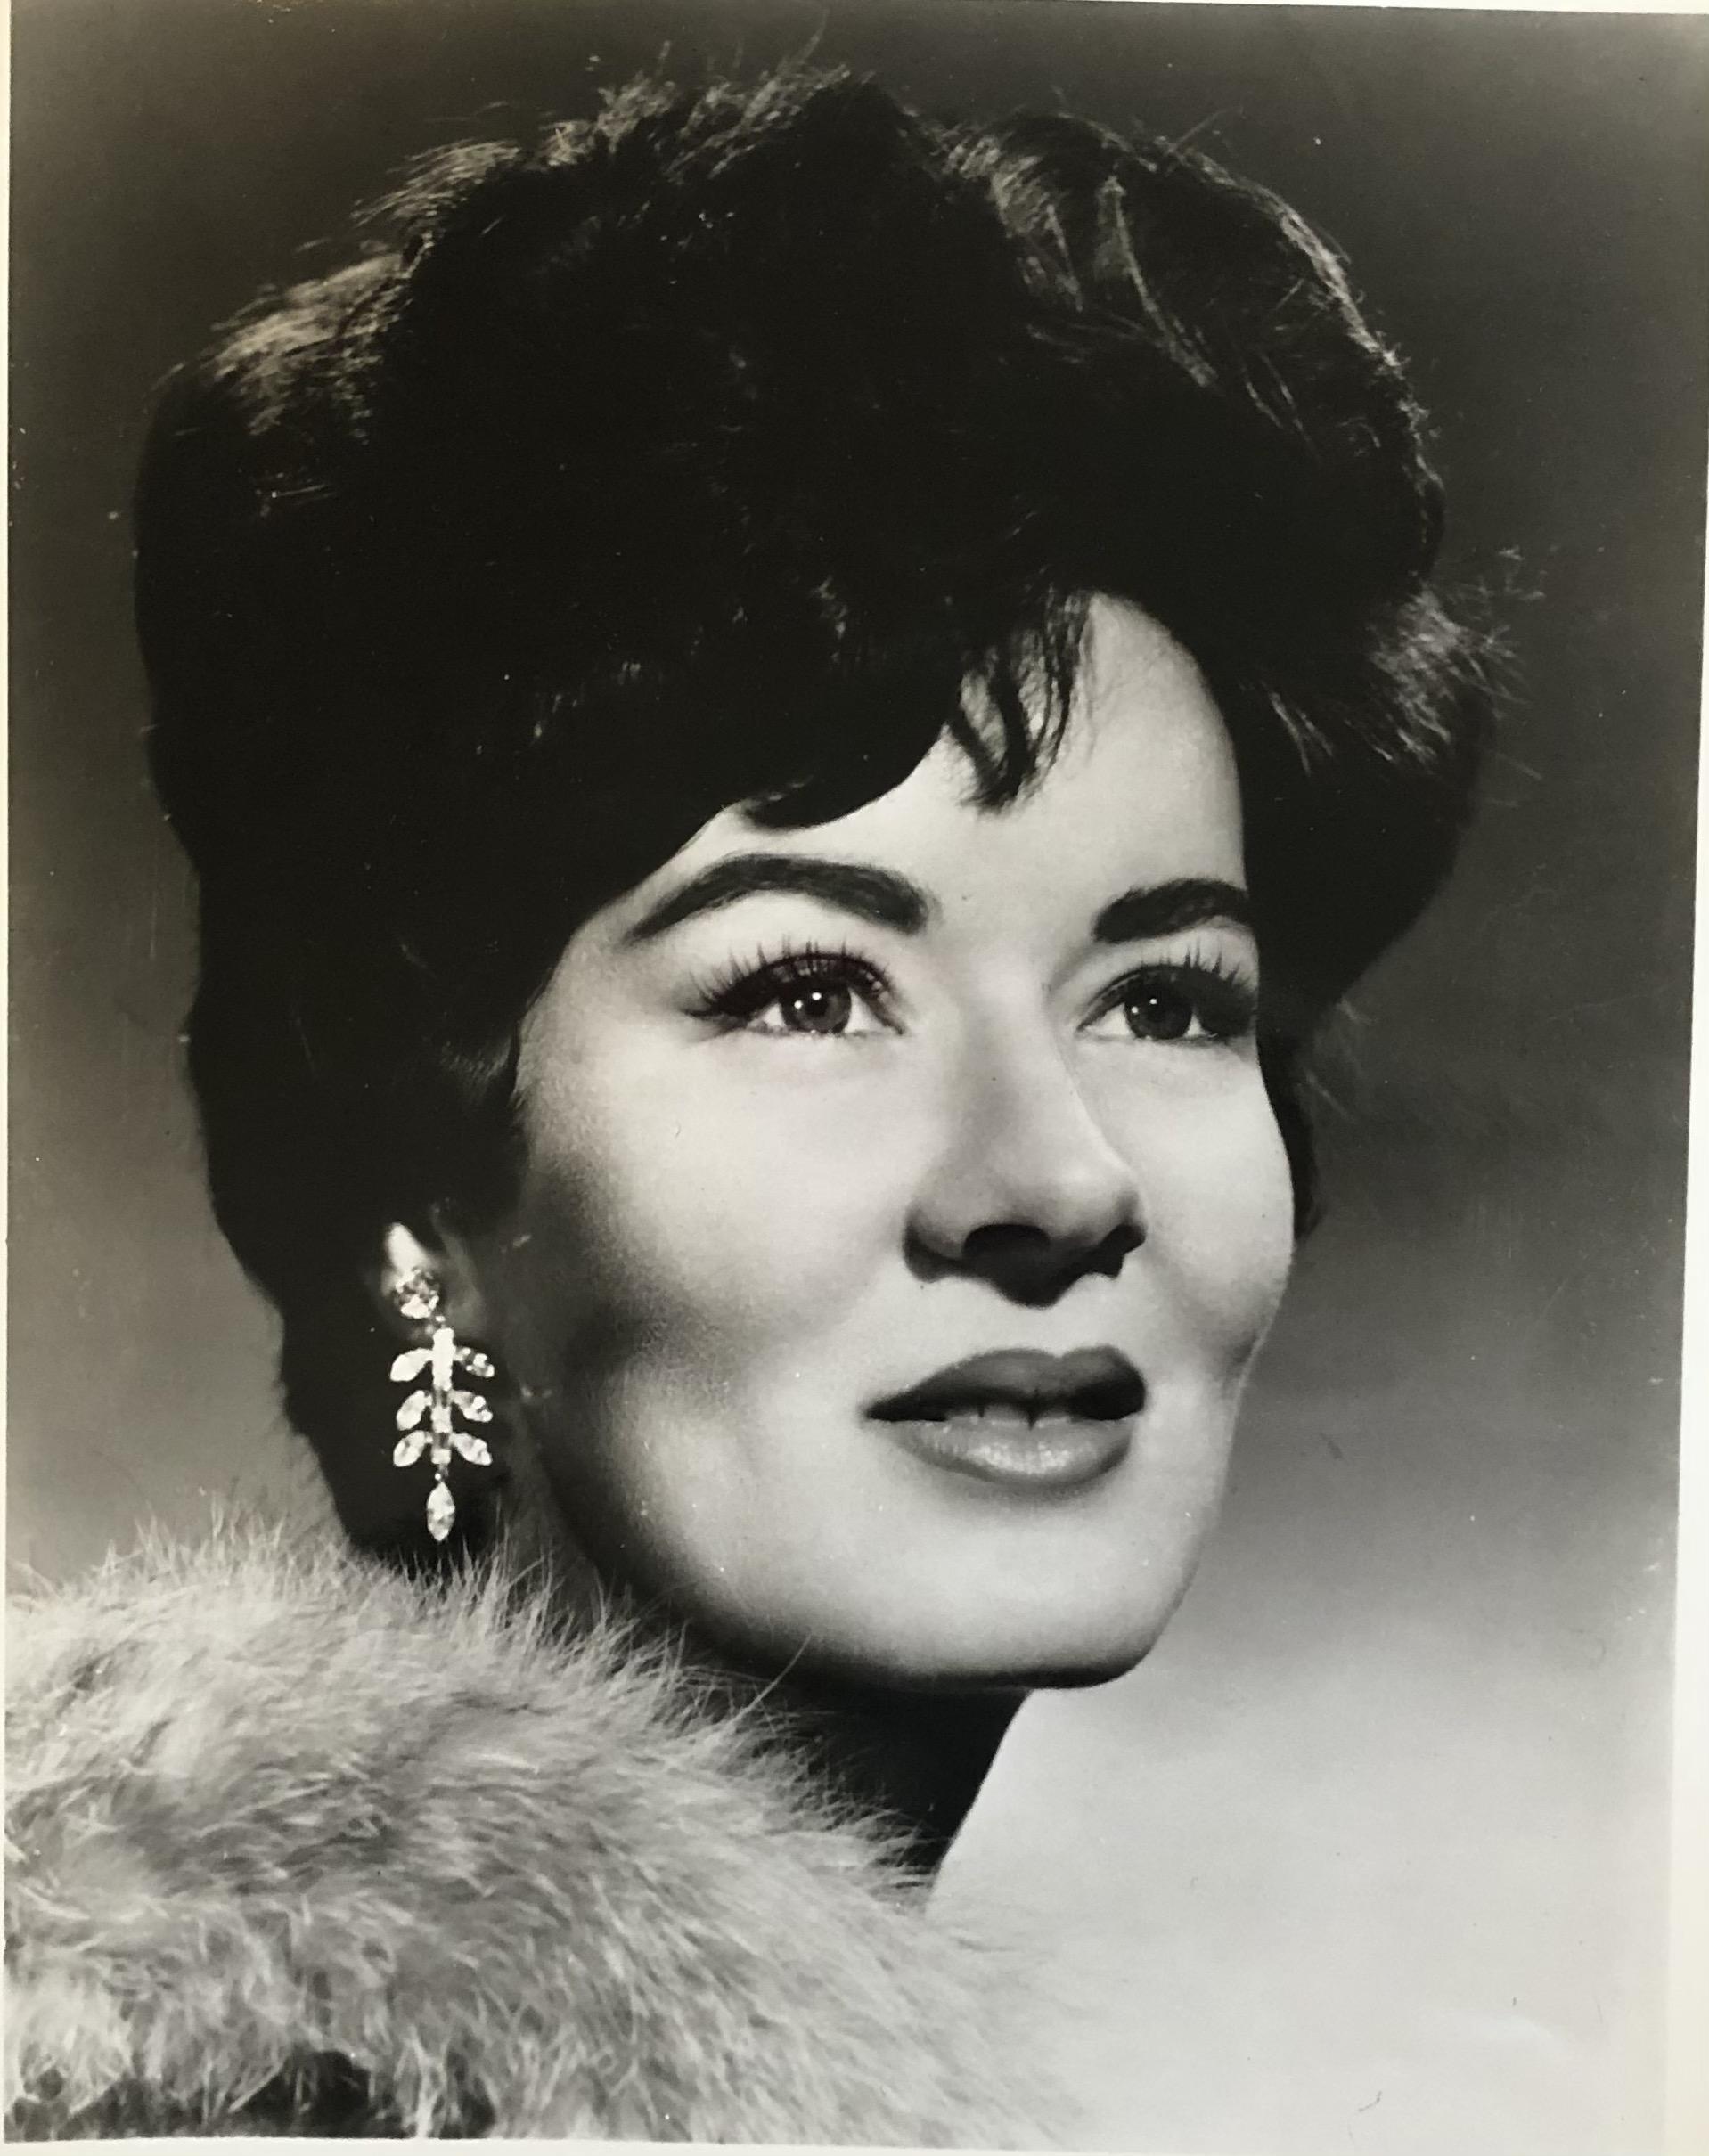 Death of leading Met soprano, 87